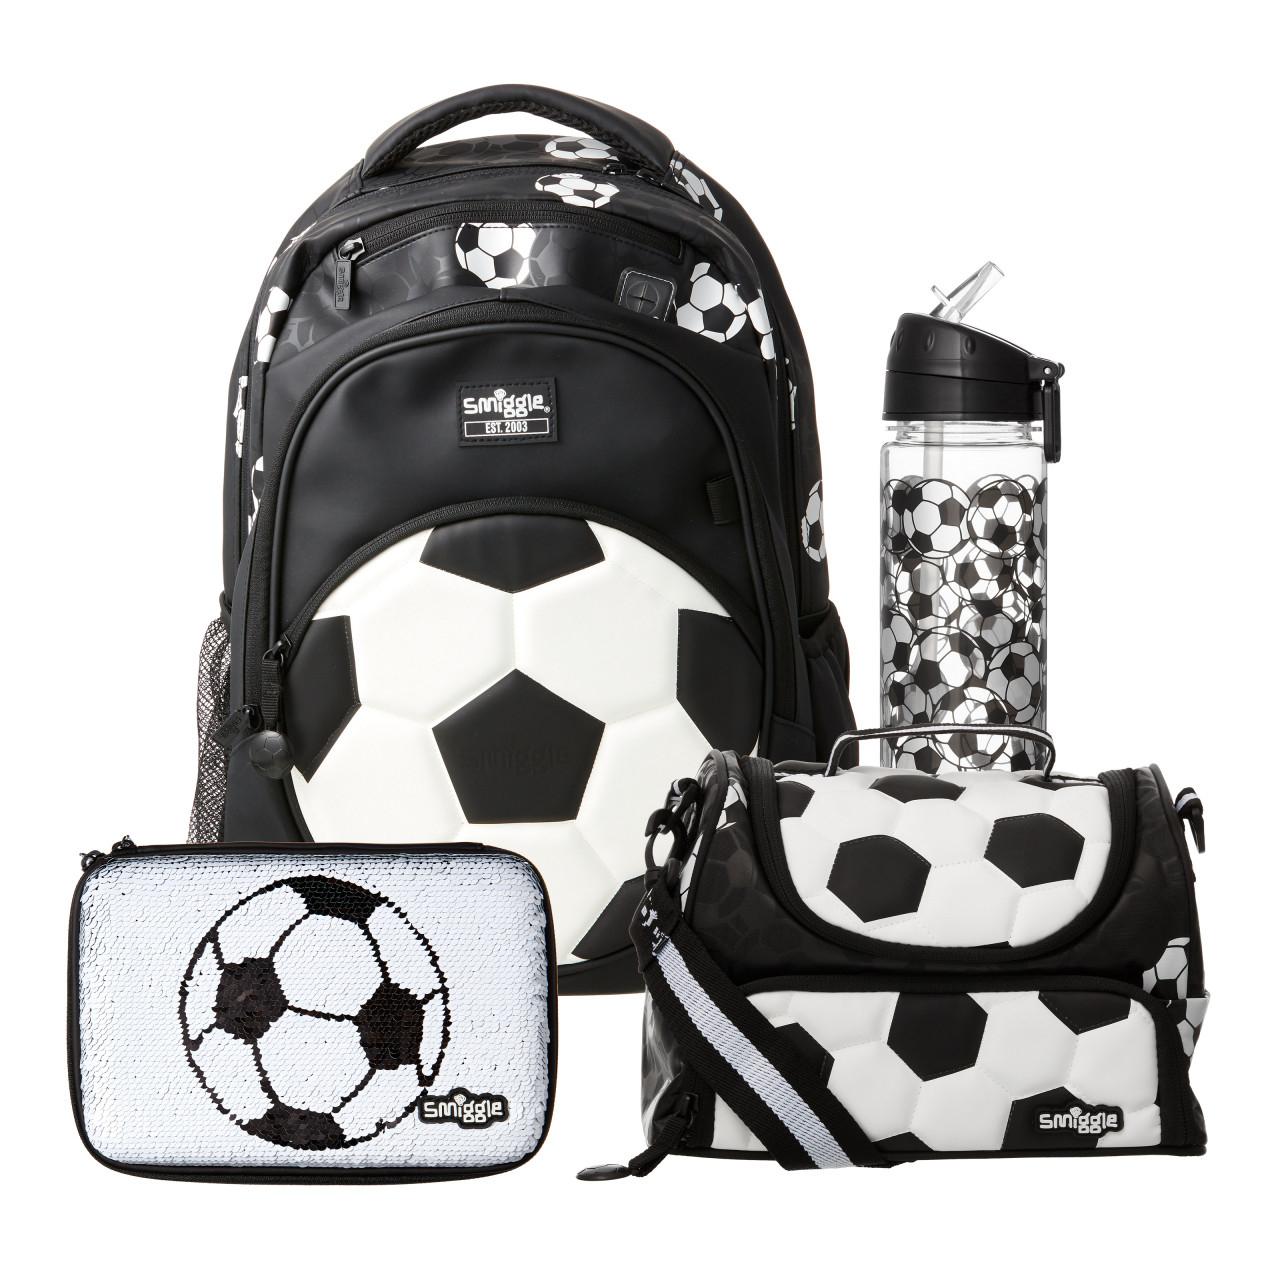 Goal School Gift Bundle £43.57 at smiggle